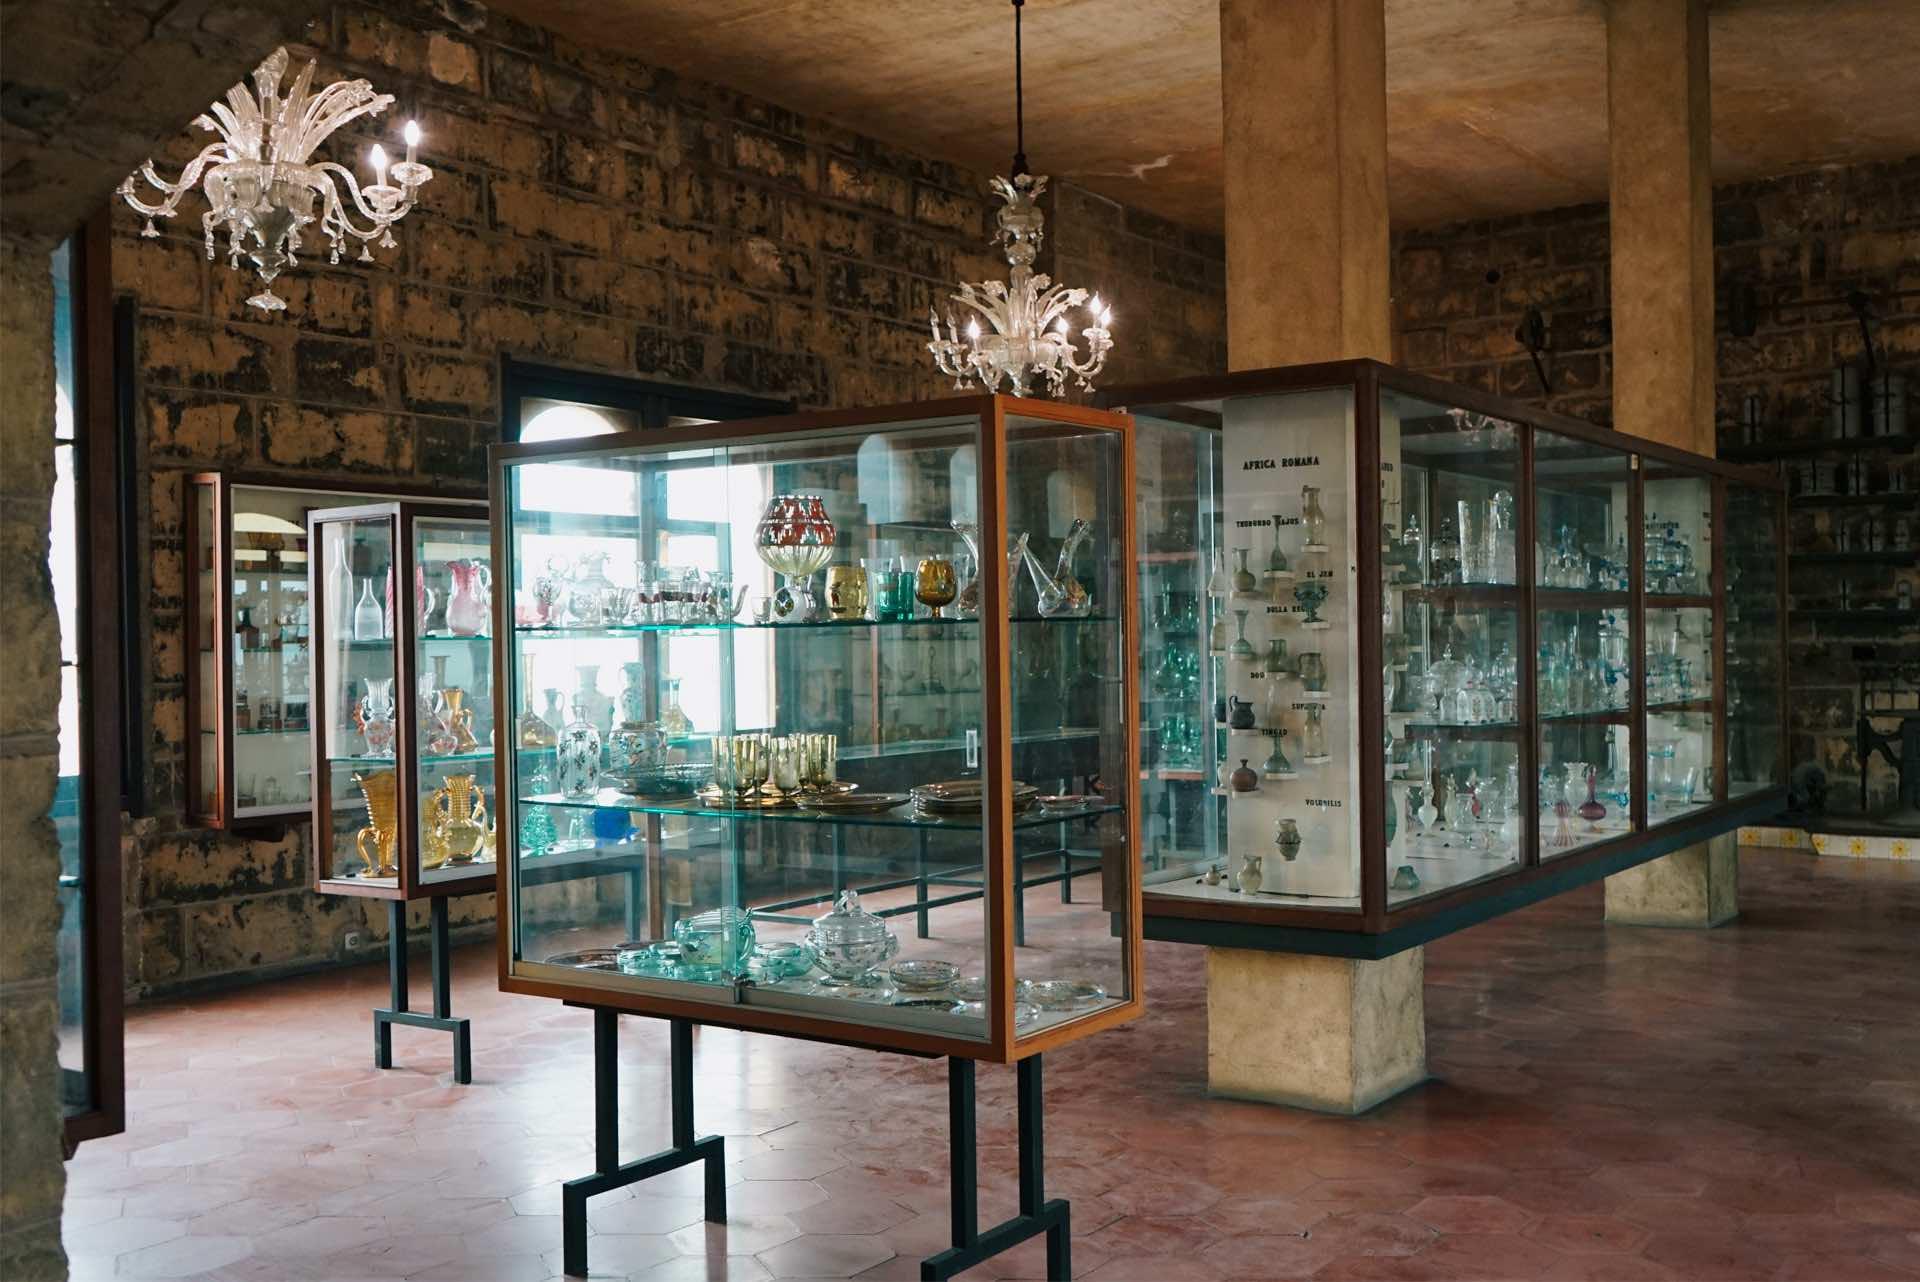 vidrio-soplado-gordiola-museo-sala-mundo-antiguo